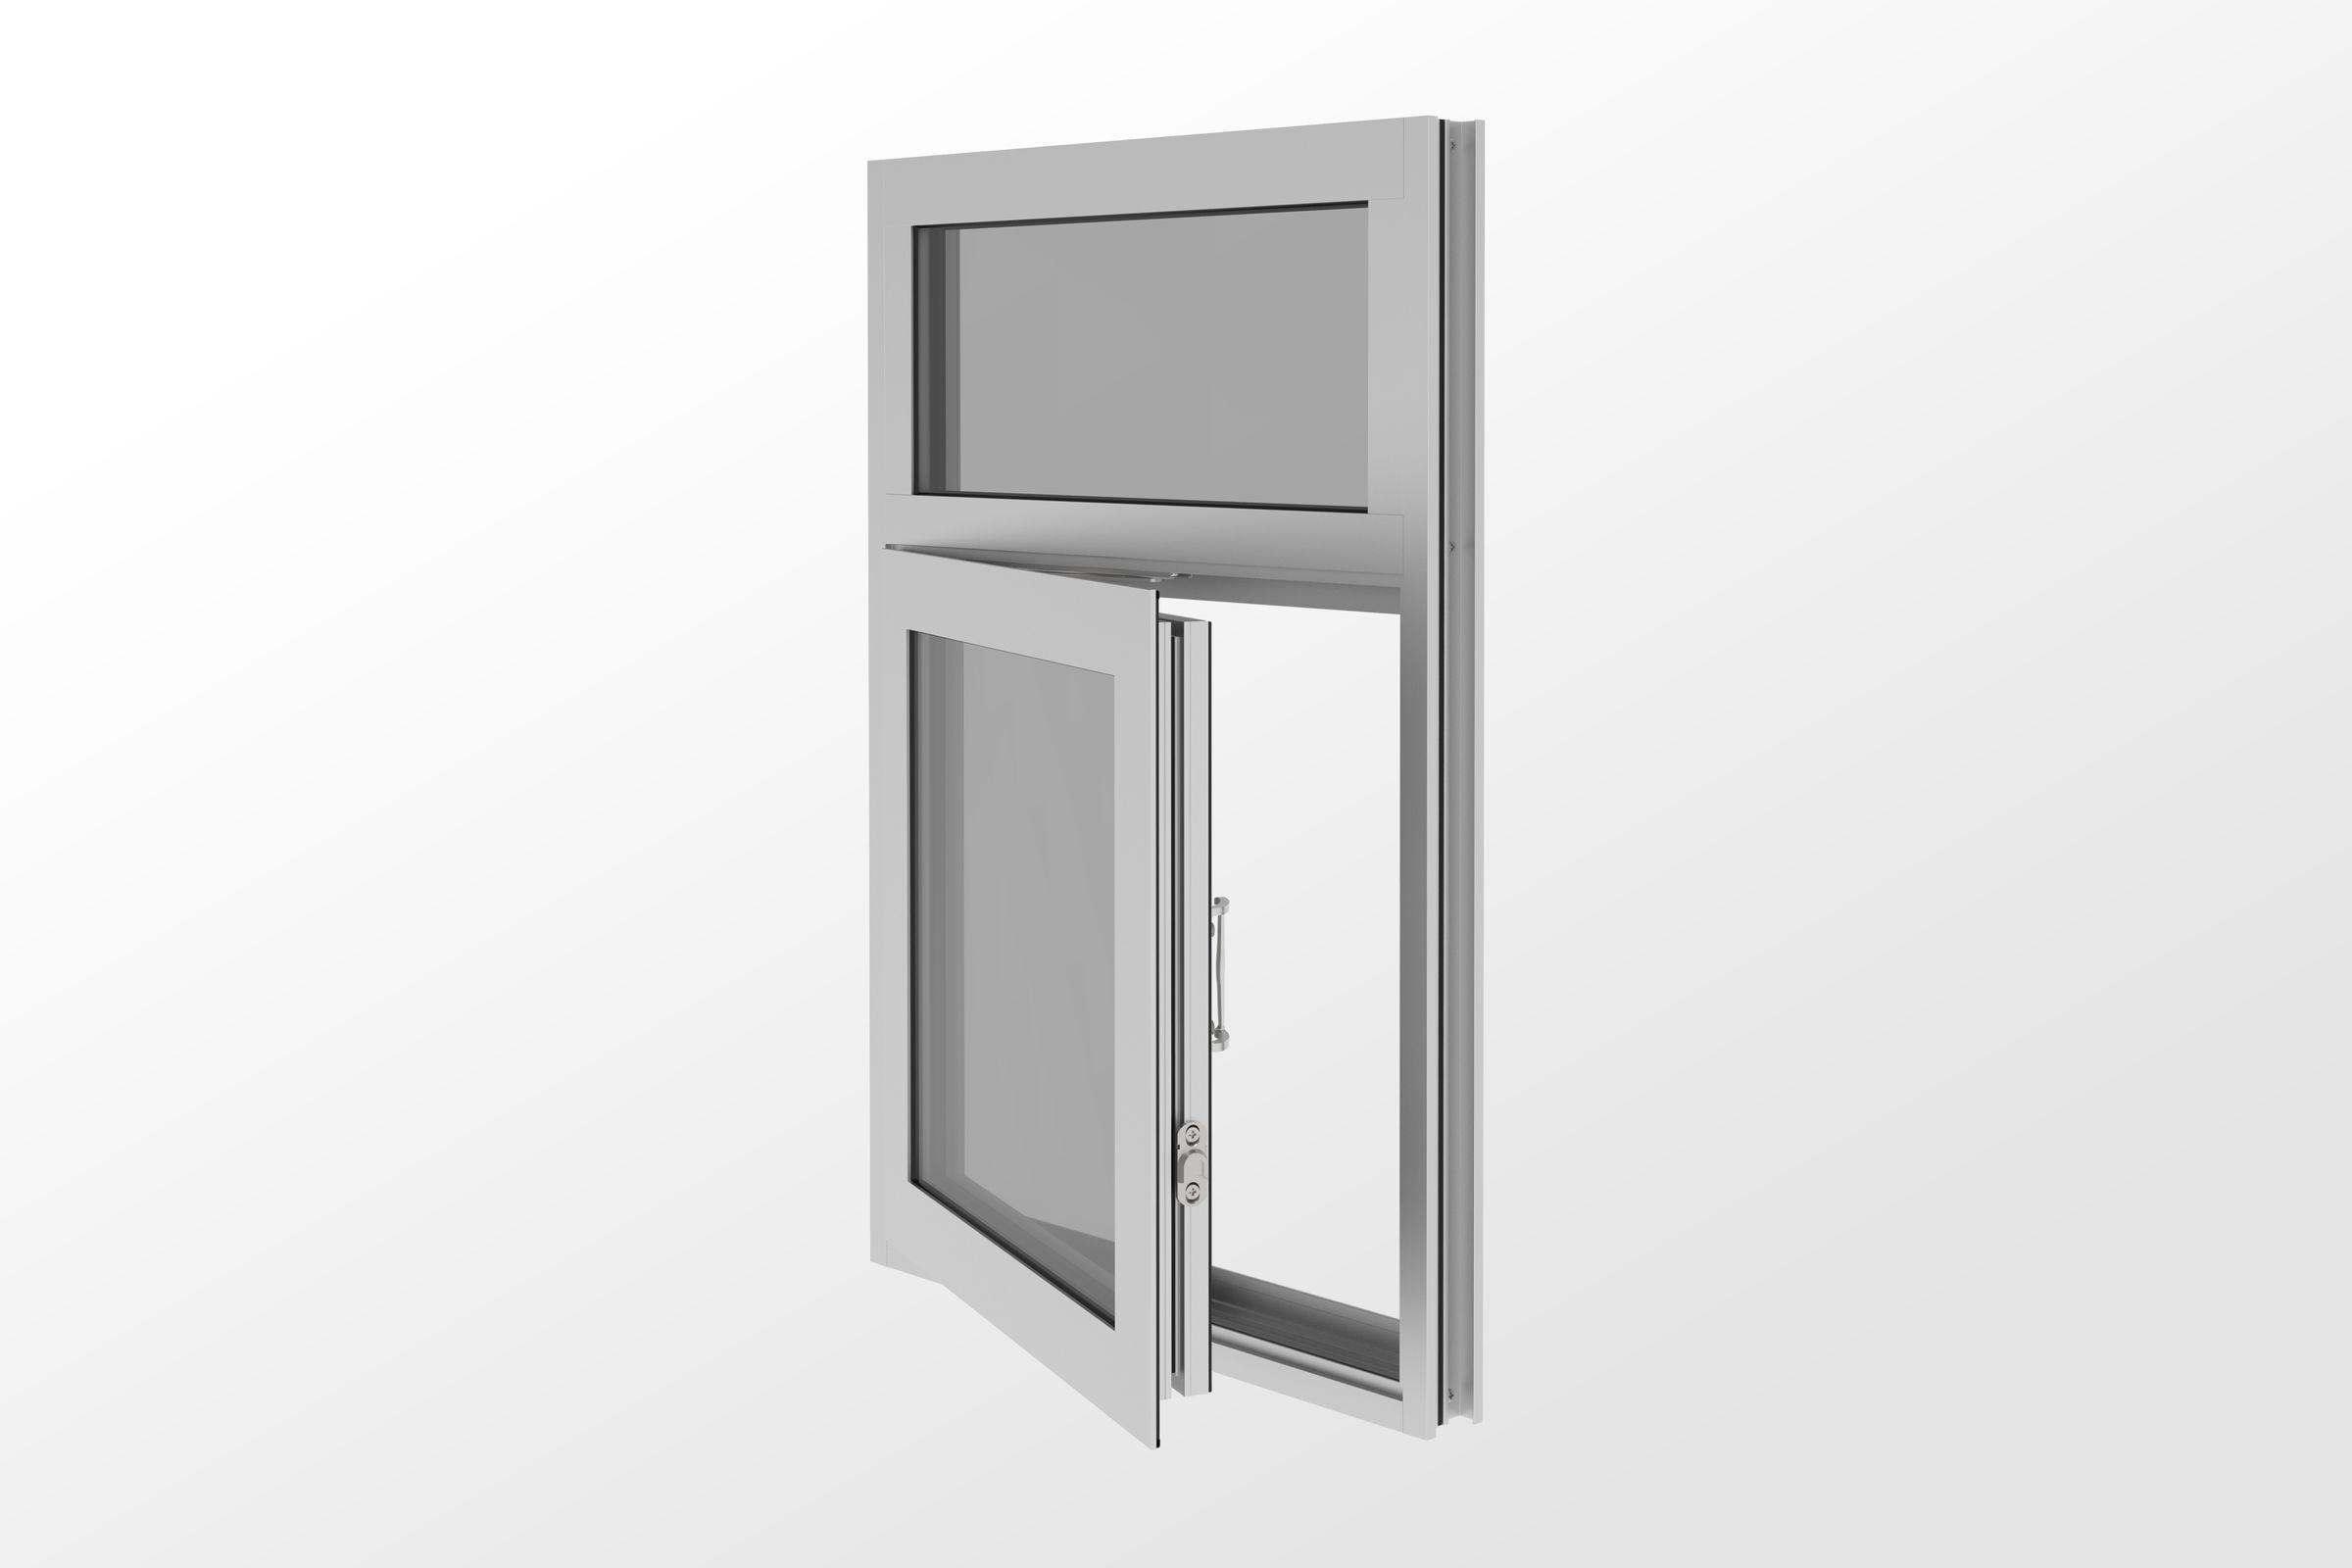 YOW 225 TU thermally broken operable window